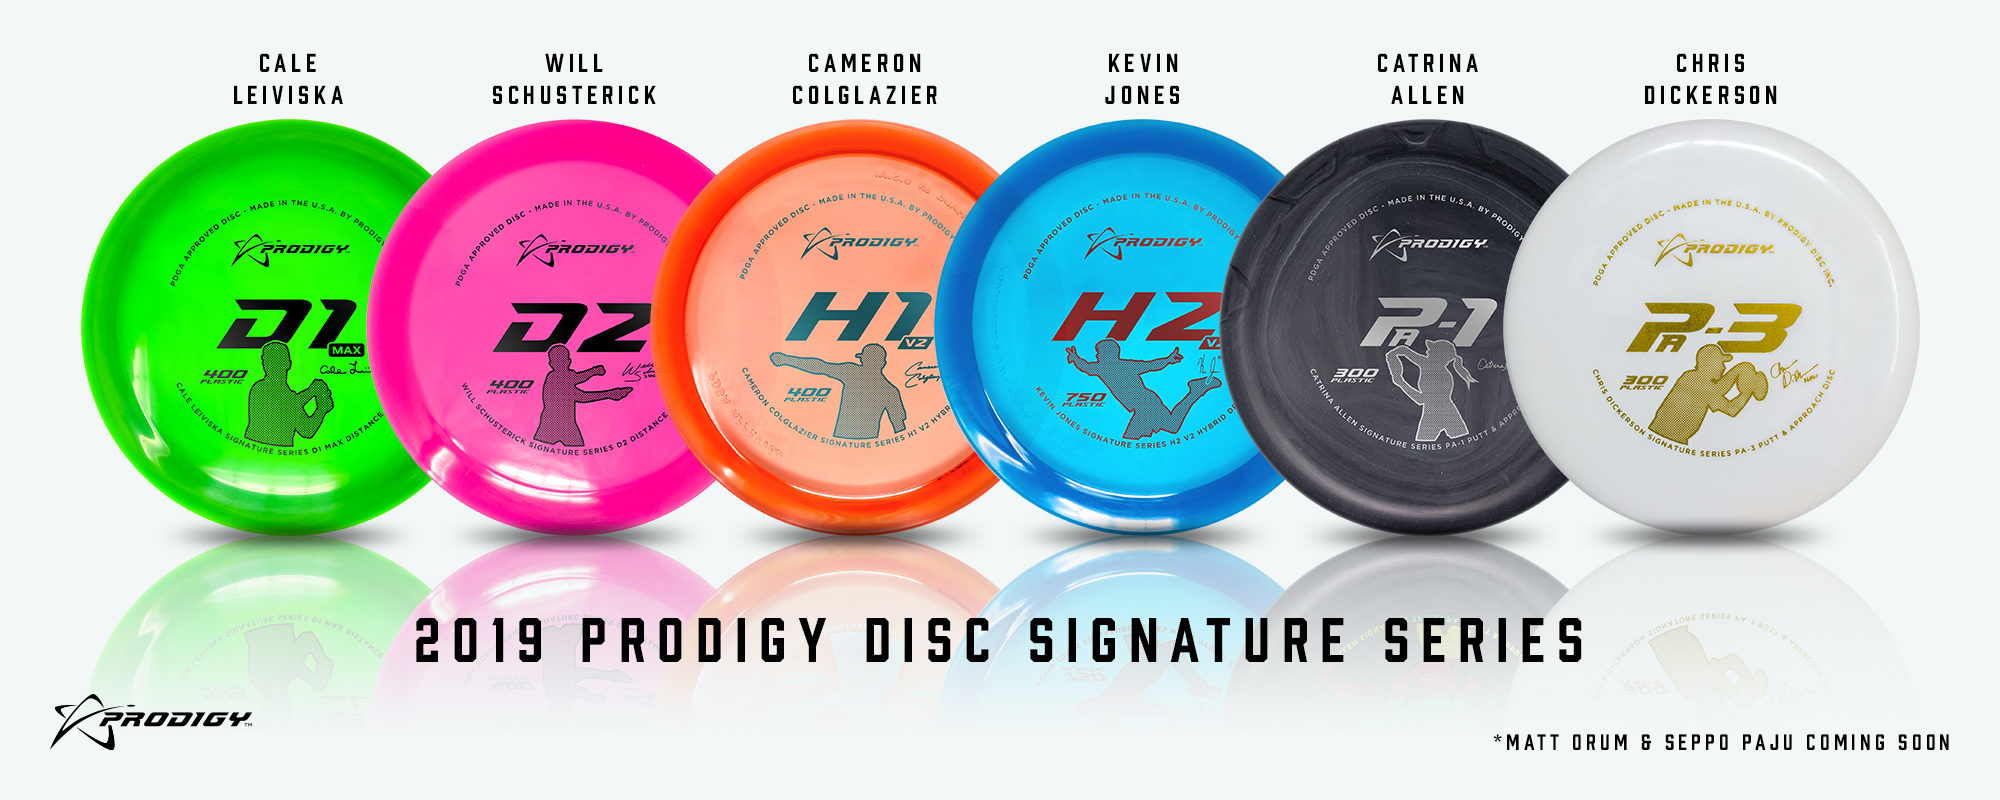 prodigy-2019-signature-series-dealer-banner.jpg